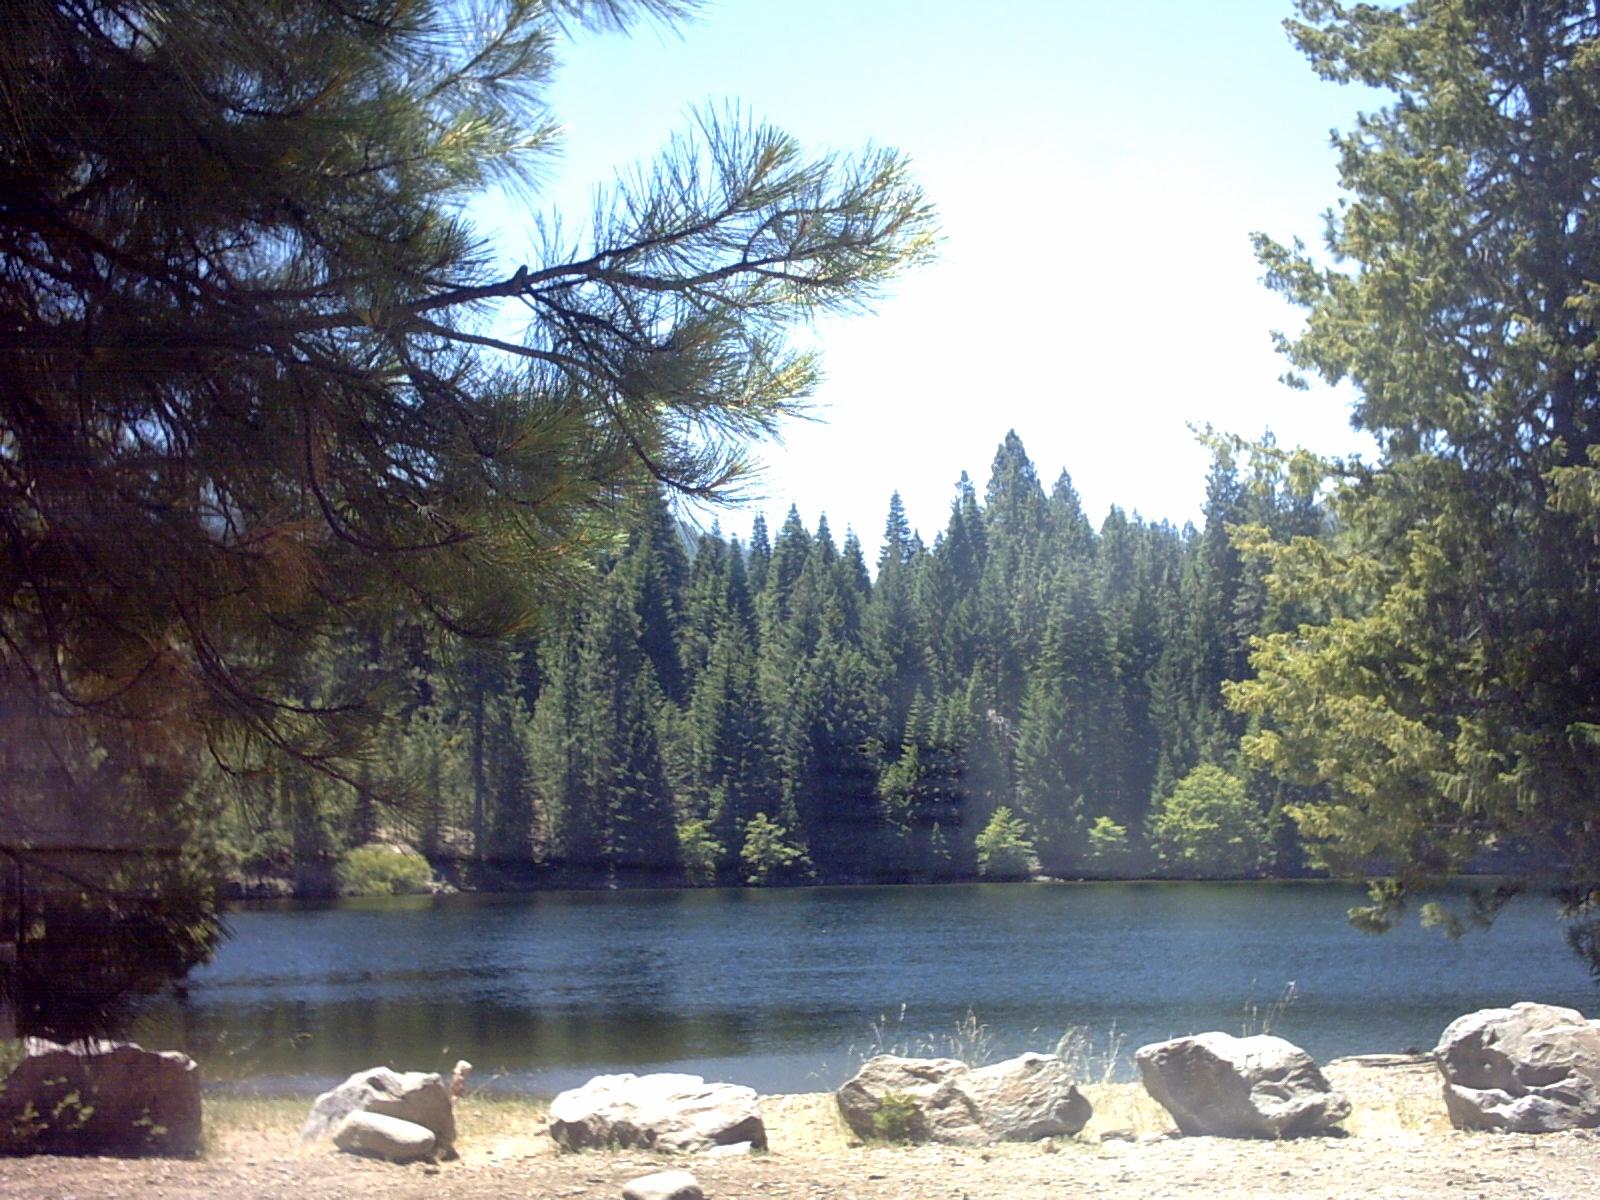 My surrounding area for Lake siskiyou resort cabins